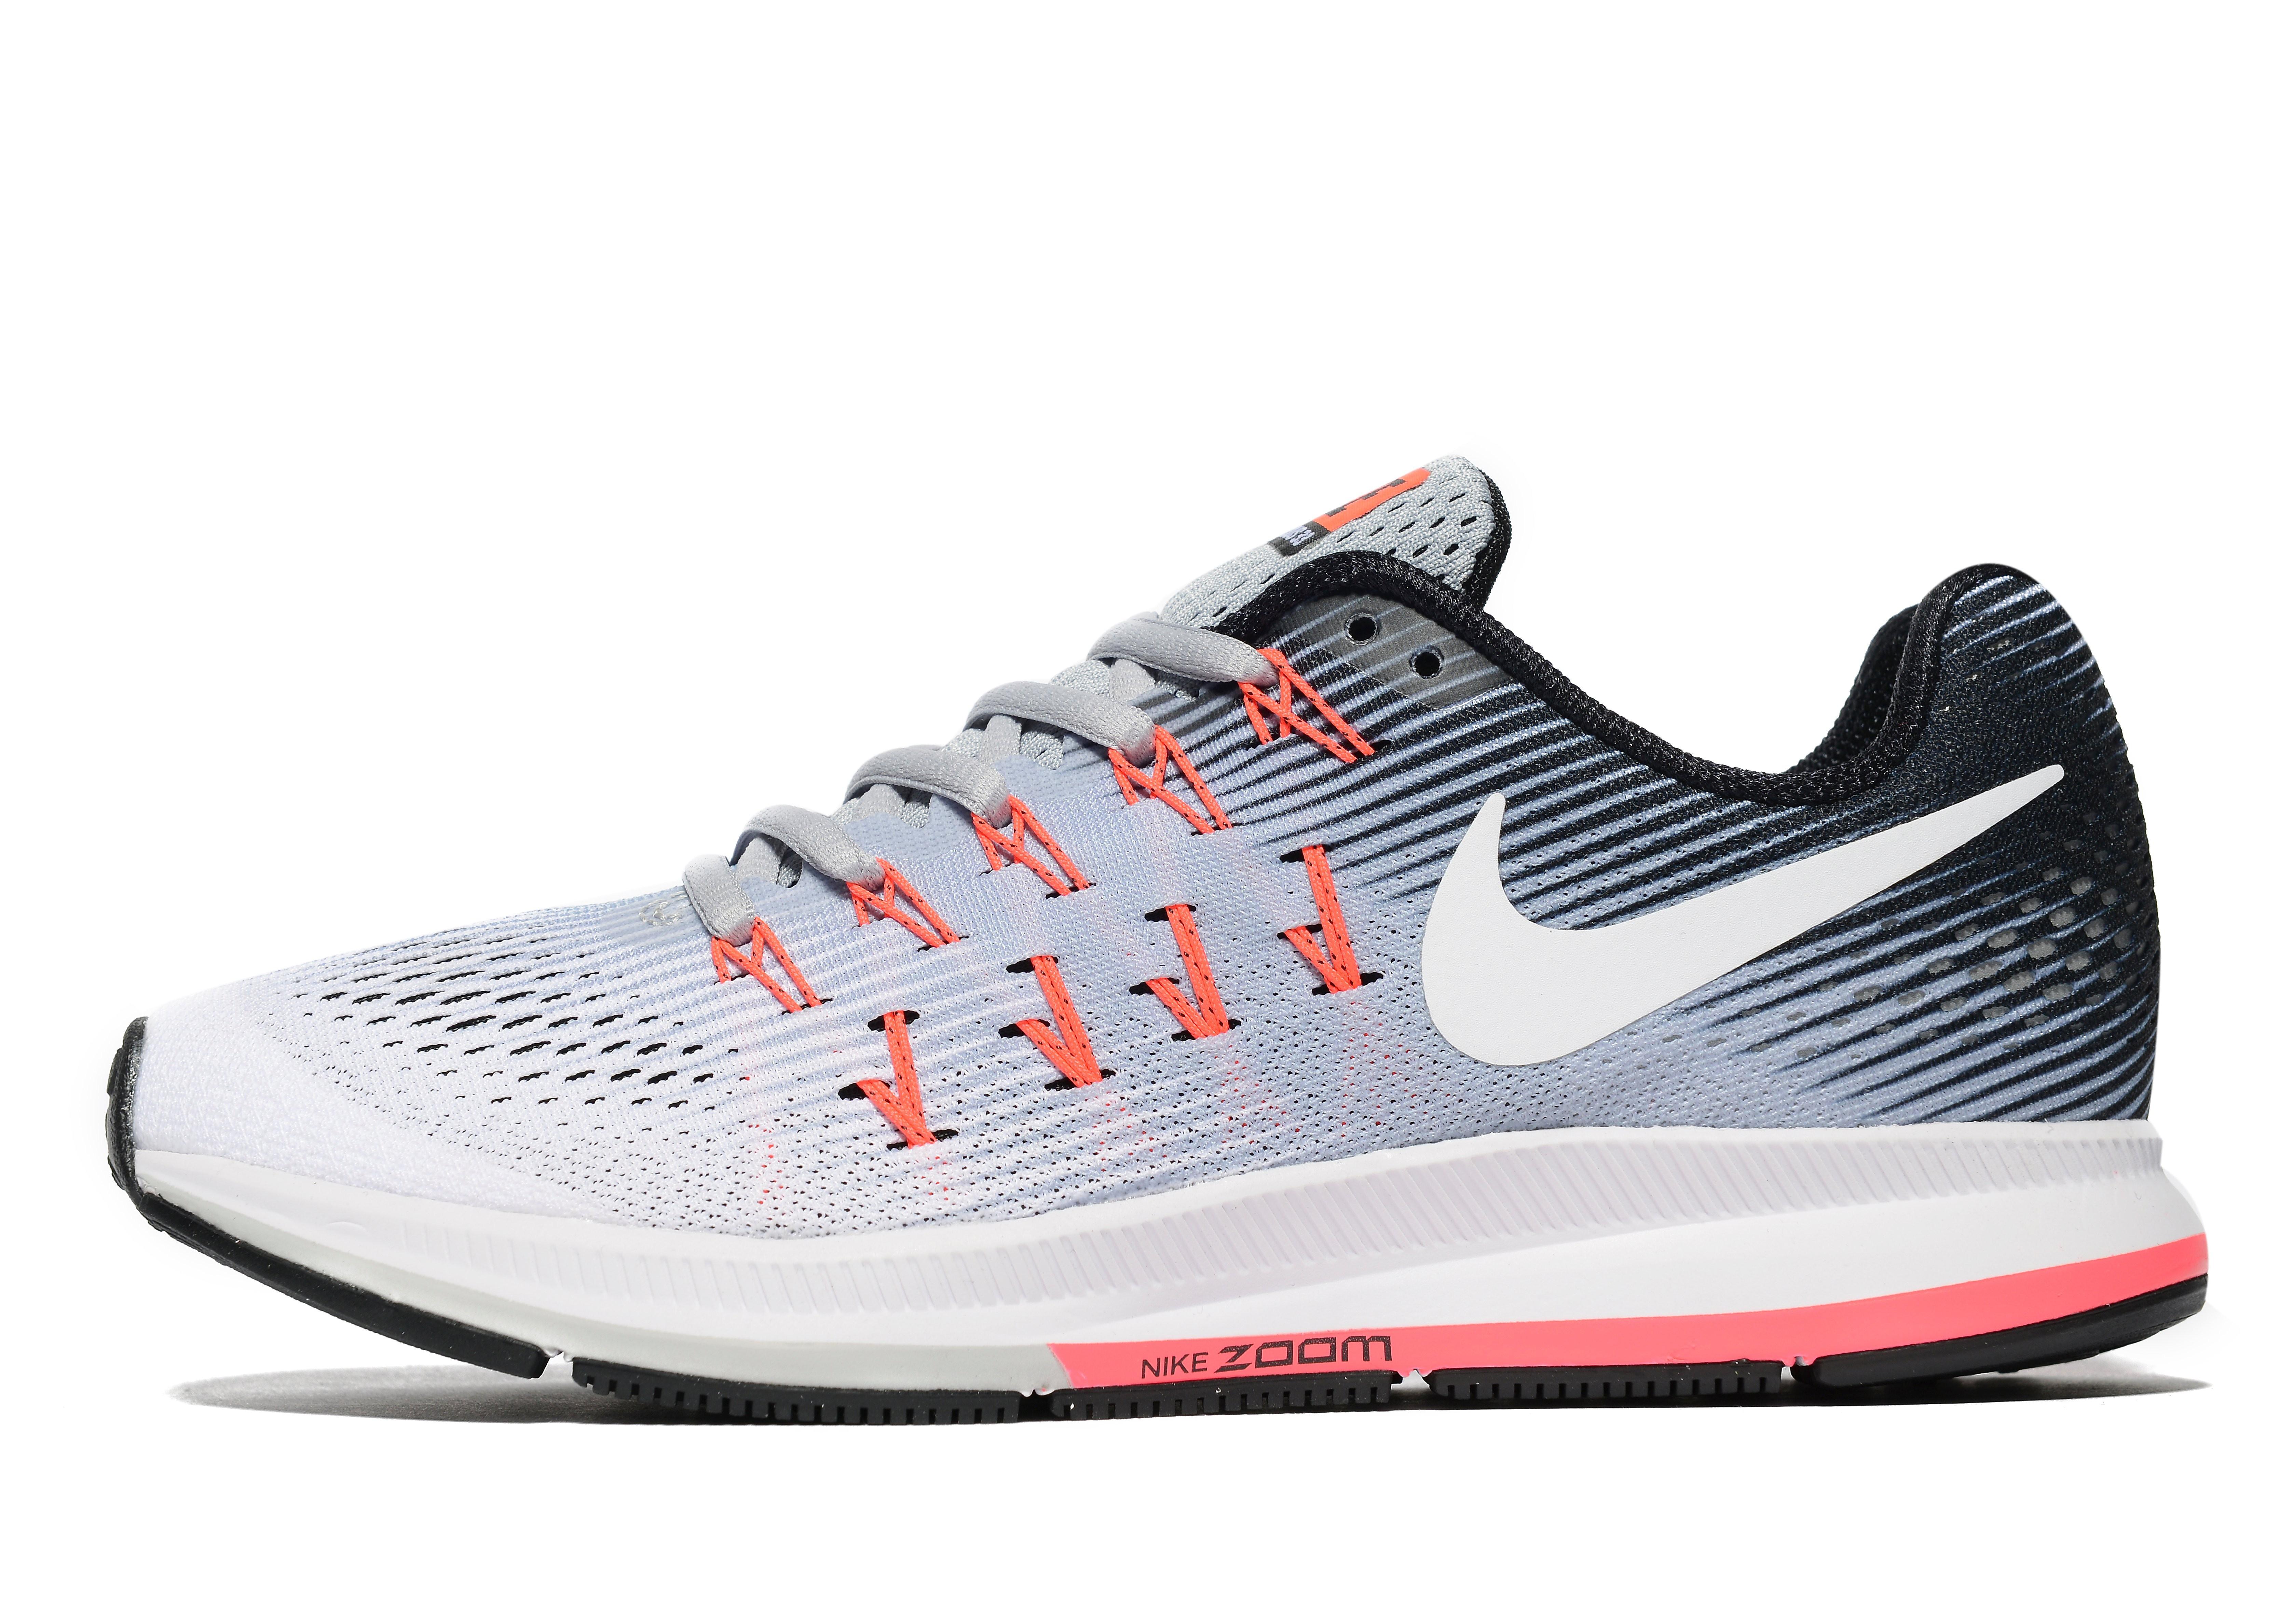 Nike Zoom Pegasus 33 Women's